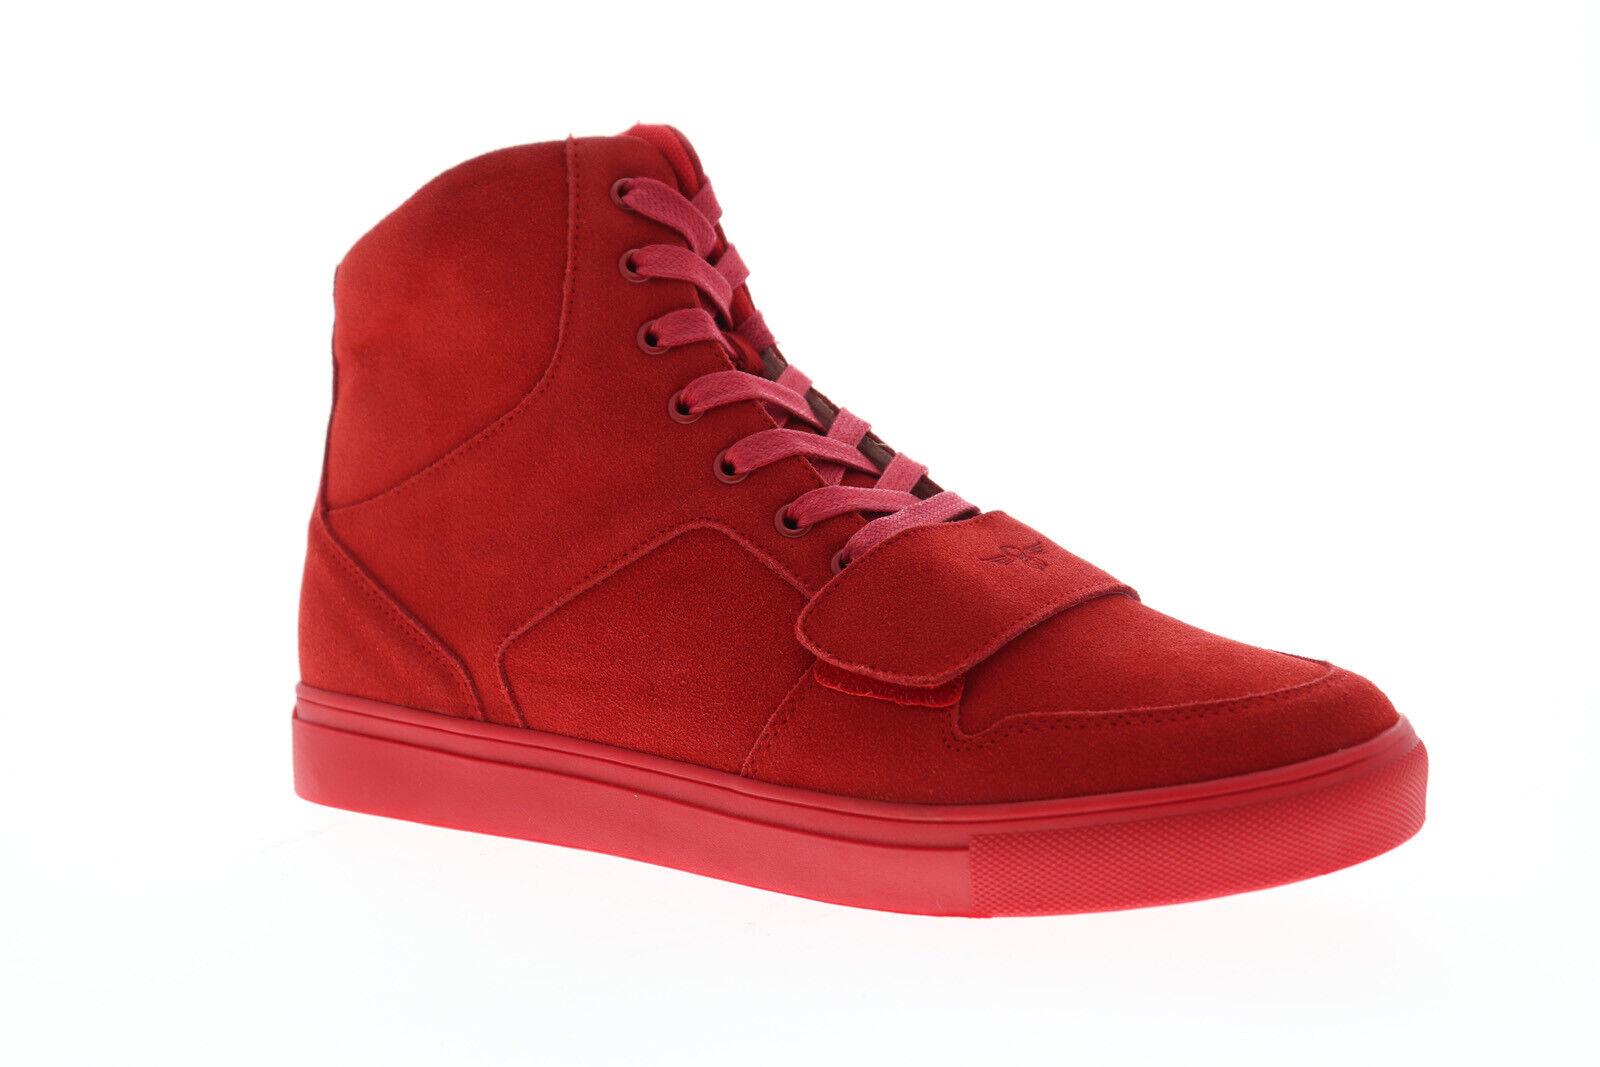 Creative Recreation administrar X Para Hombre Rojo Ante Zapatos Tenis altas con cordones